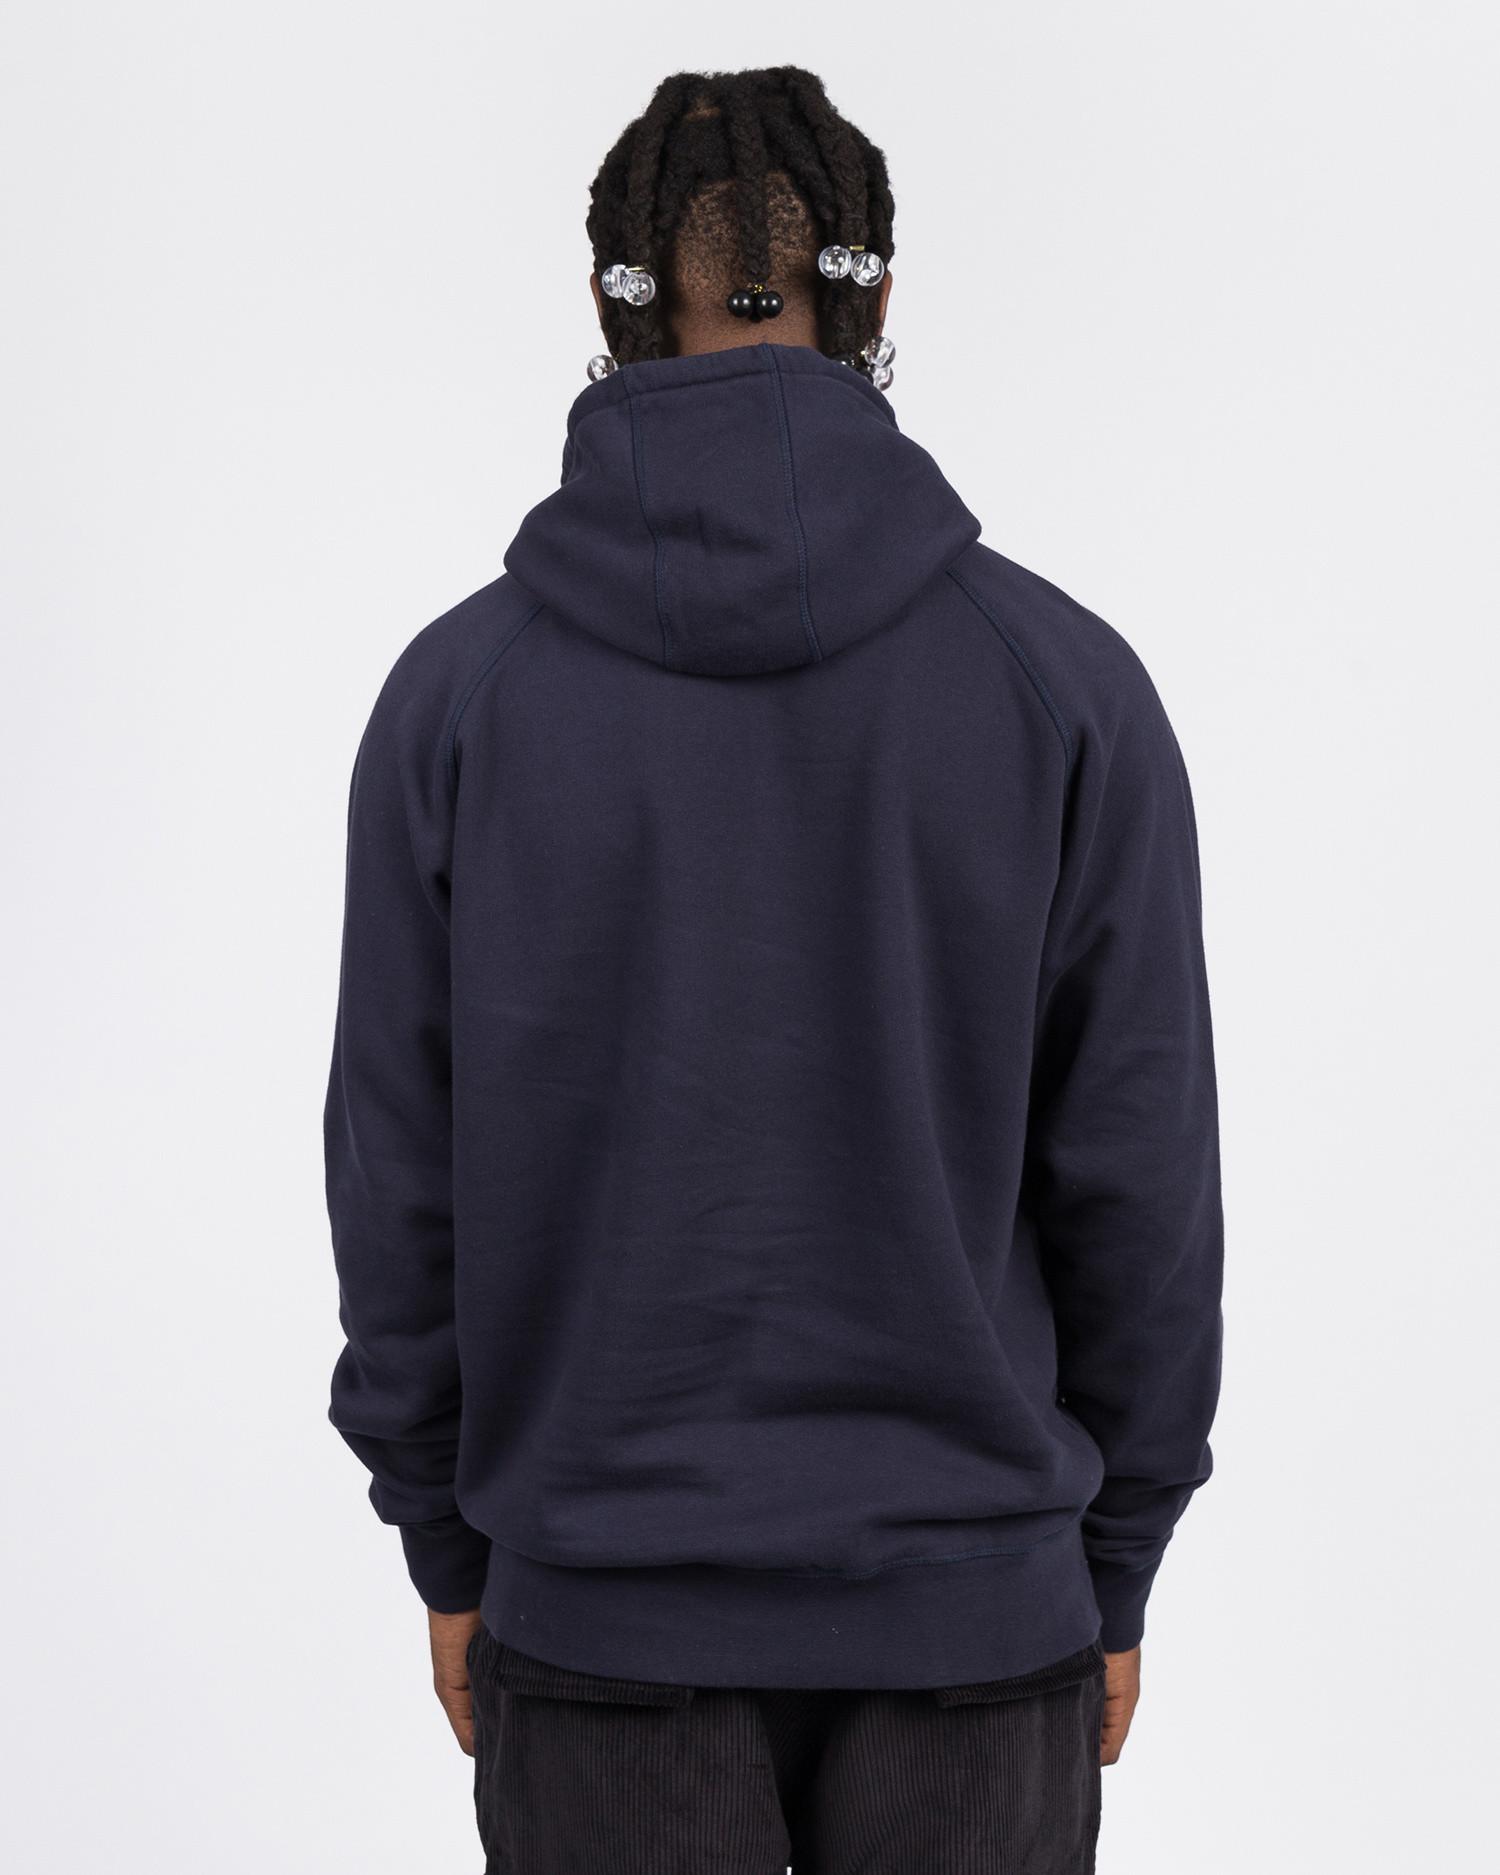 Pop Trading Co royal 'O' hoodie navy